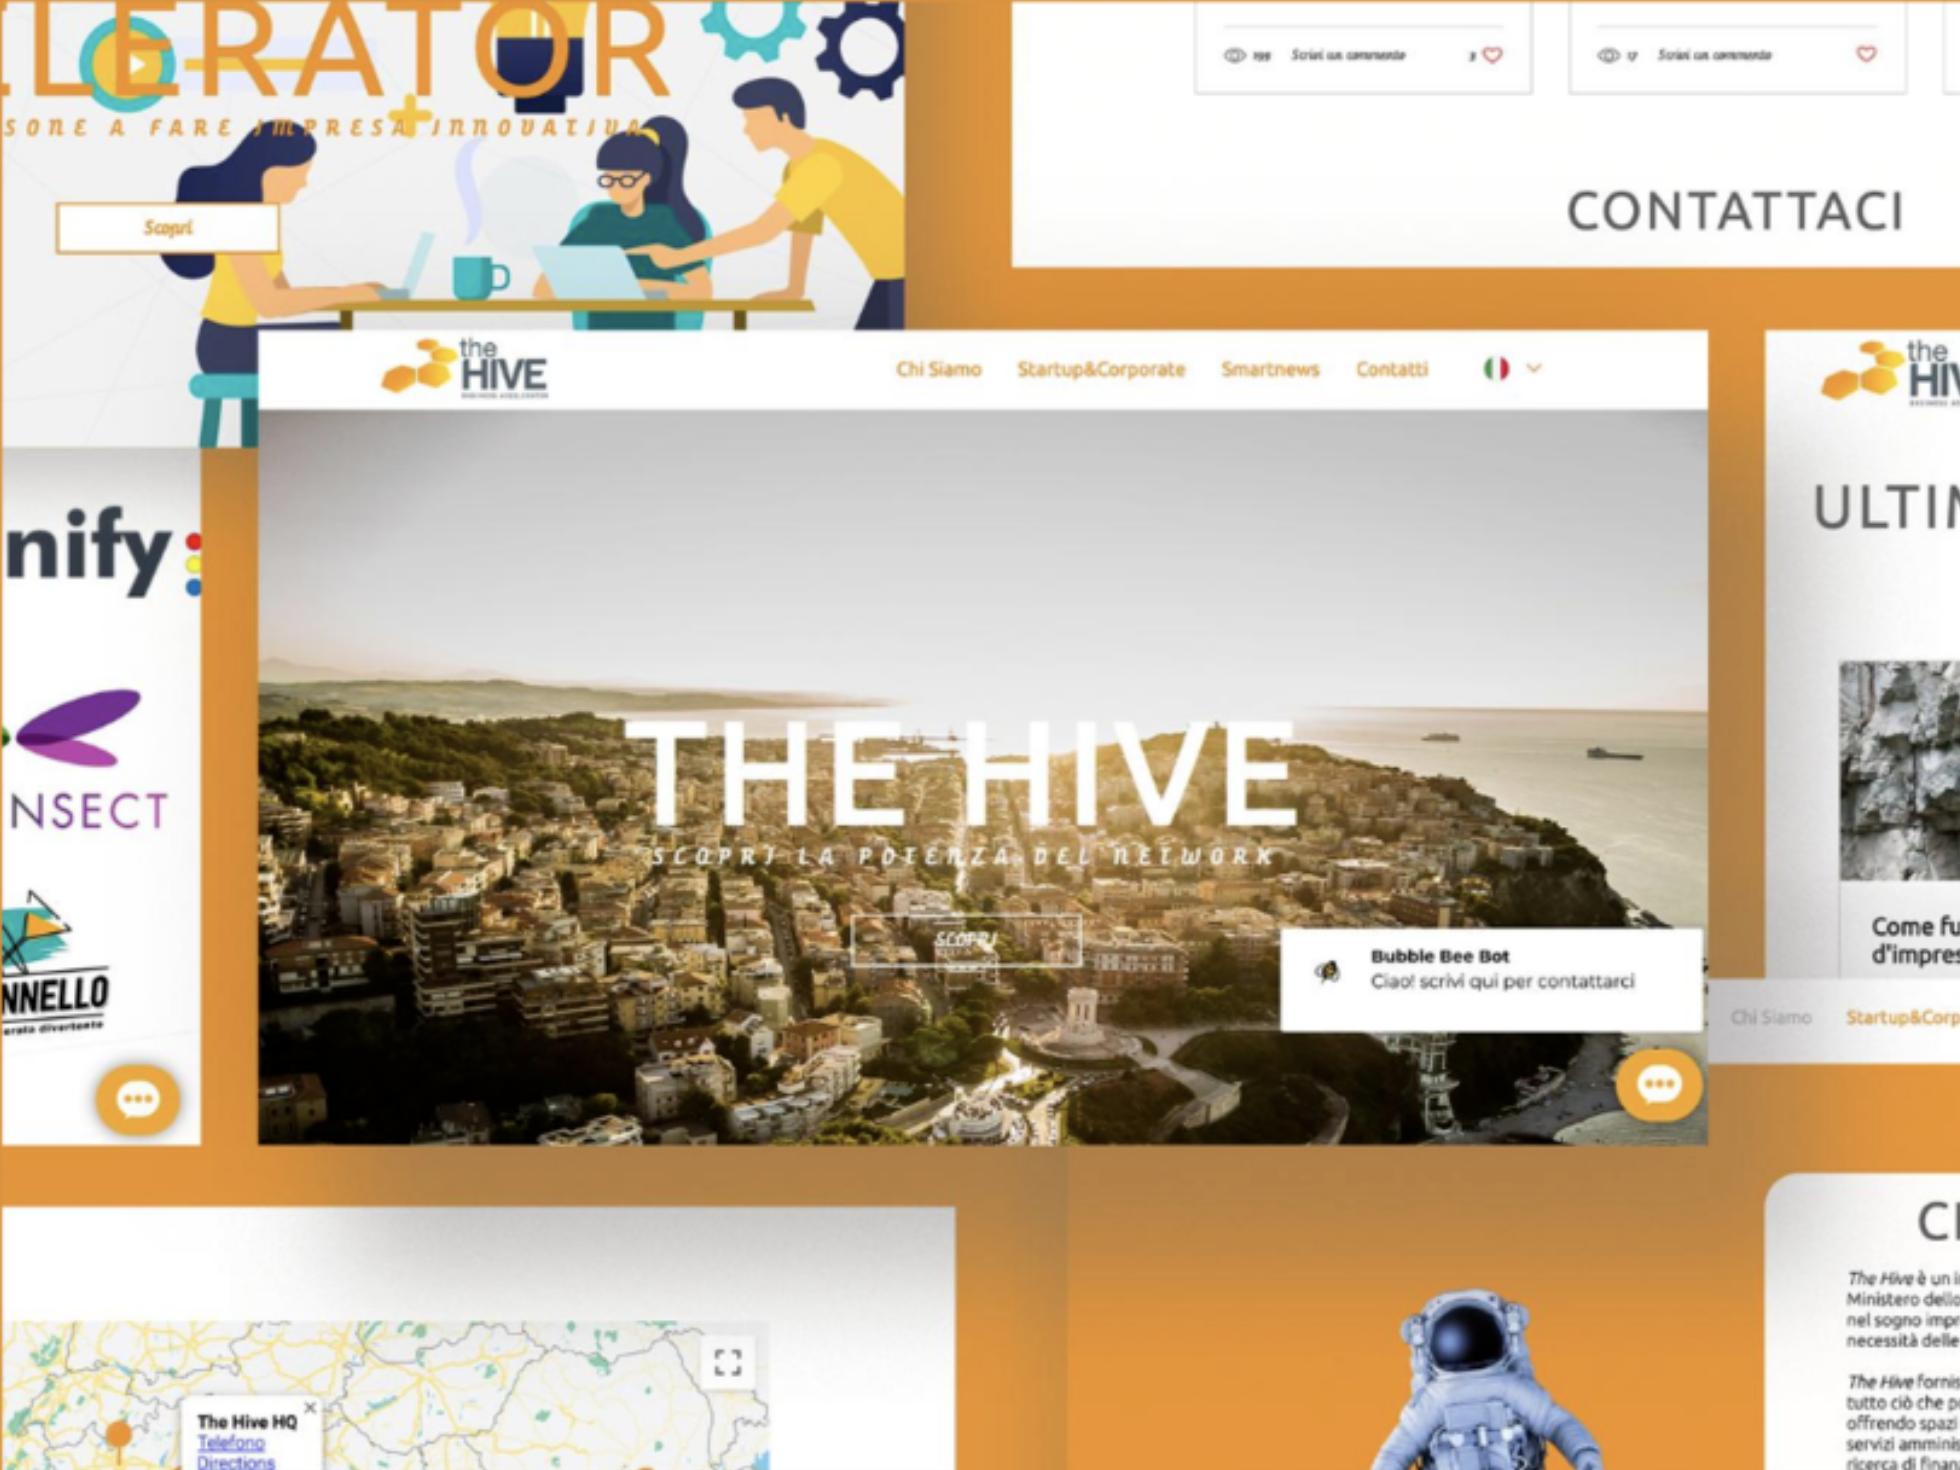 Web design of a business accelerator website with members area